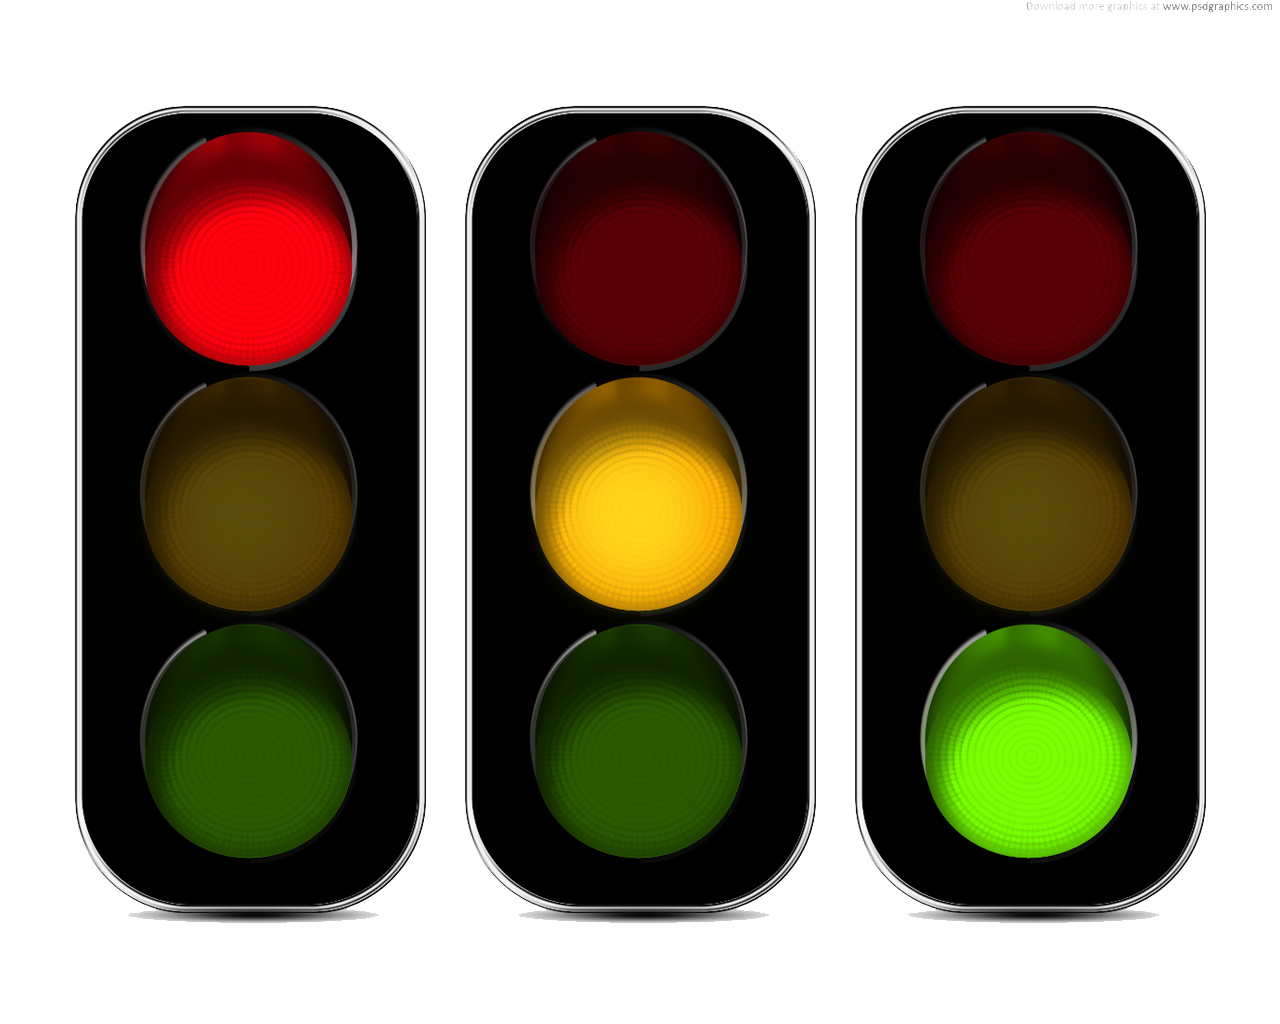 Traffic light emoticon free. Lights clipart yellow